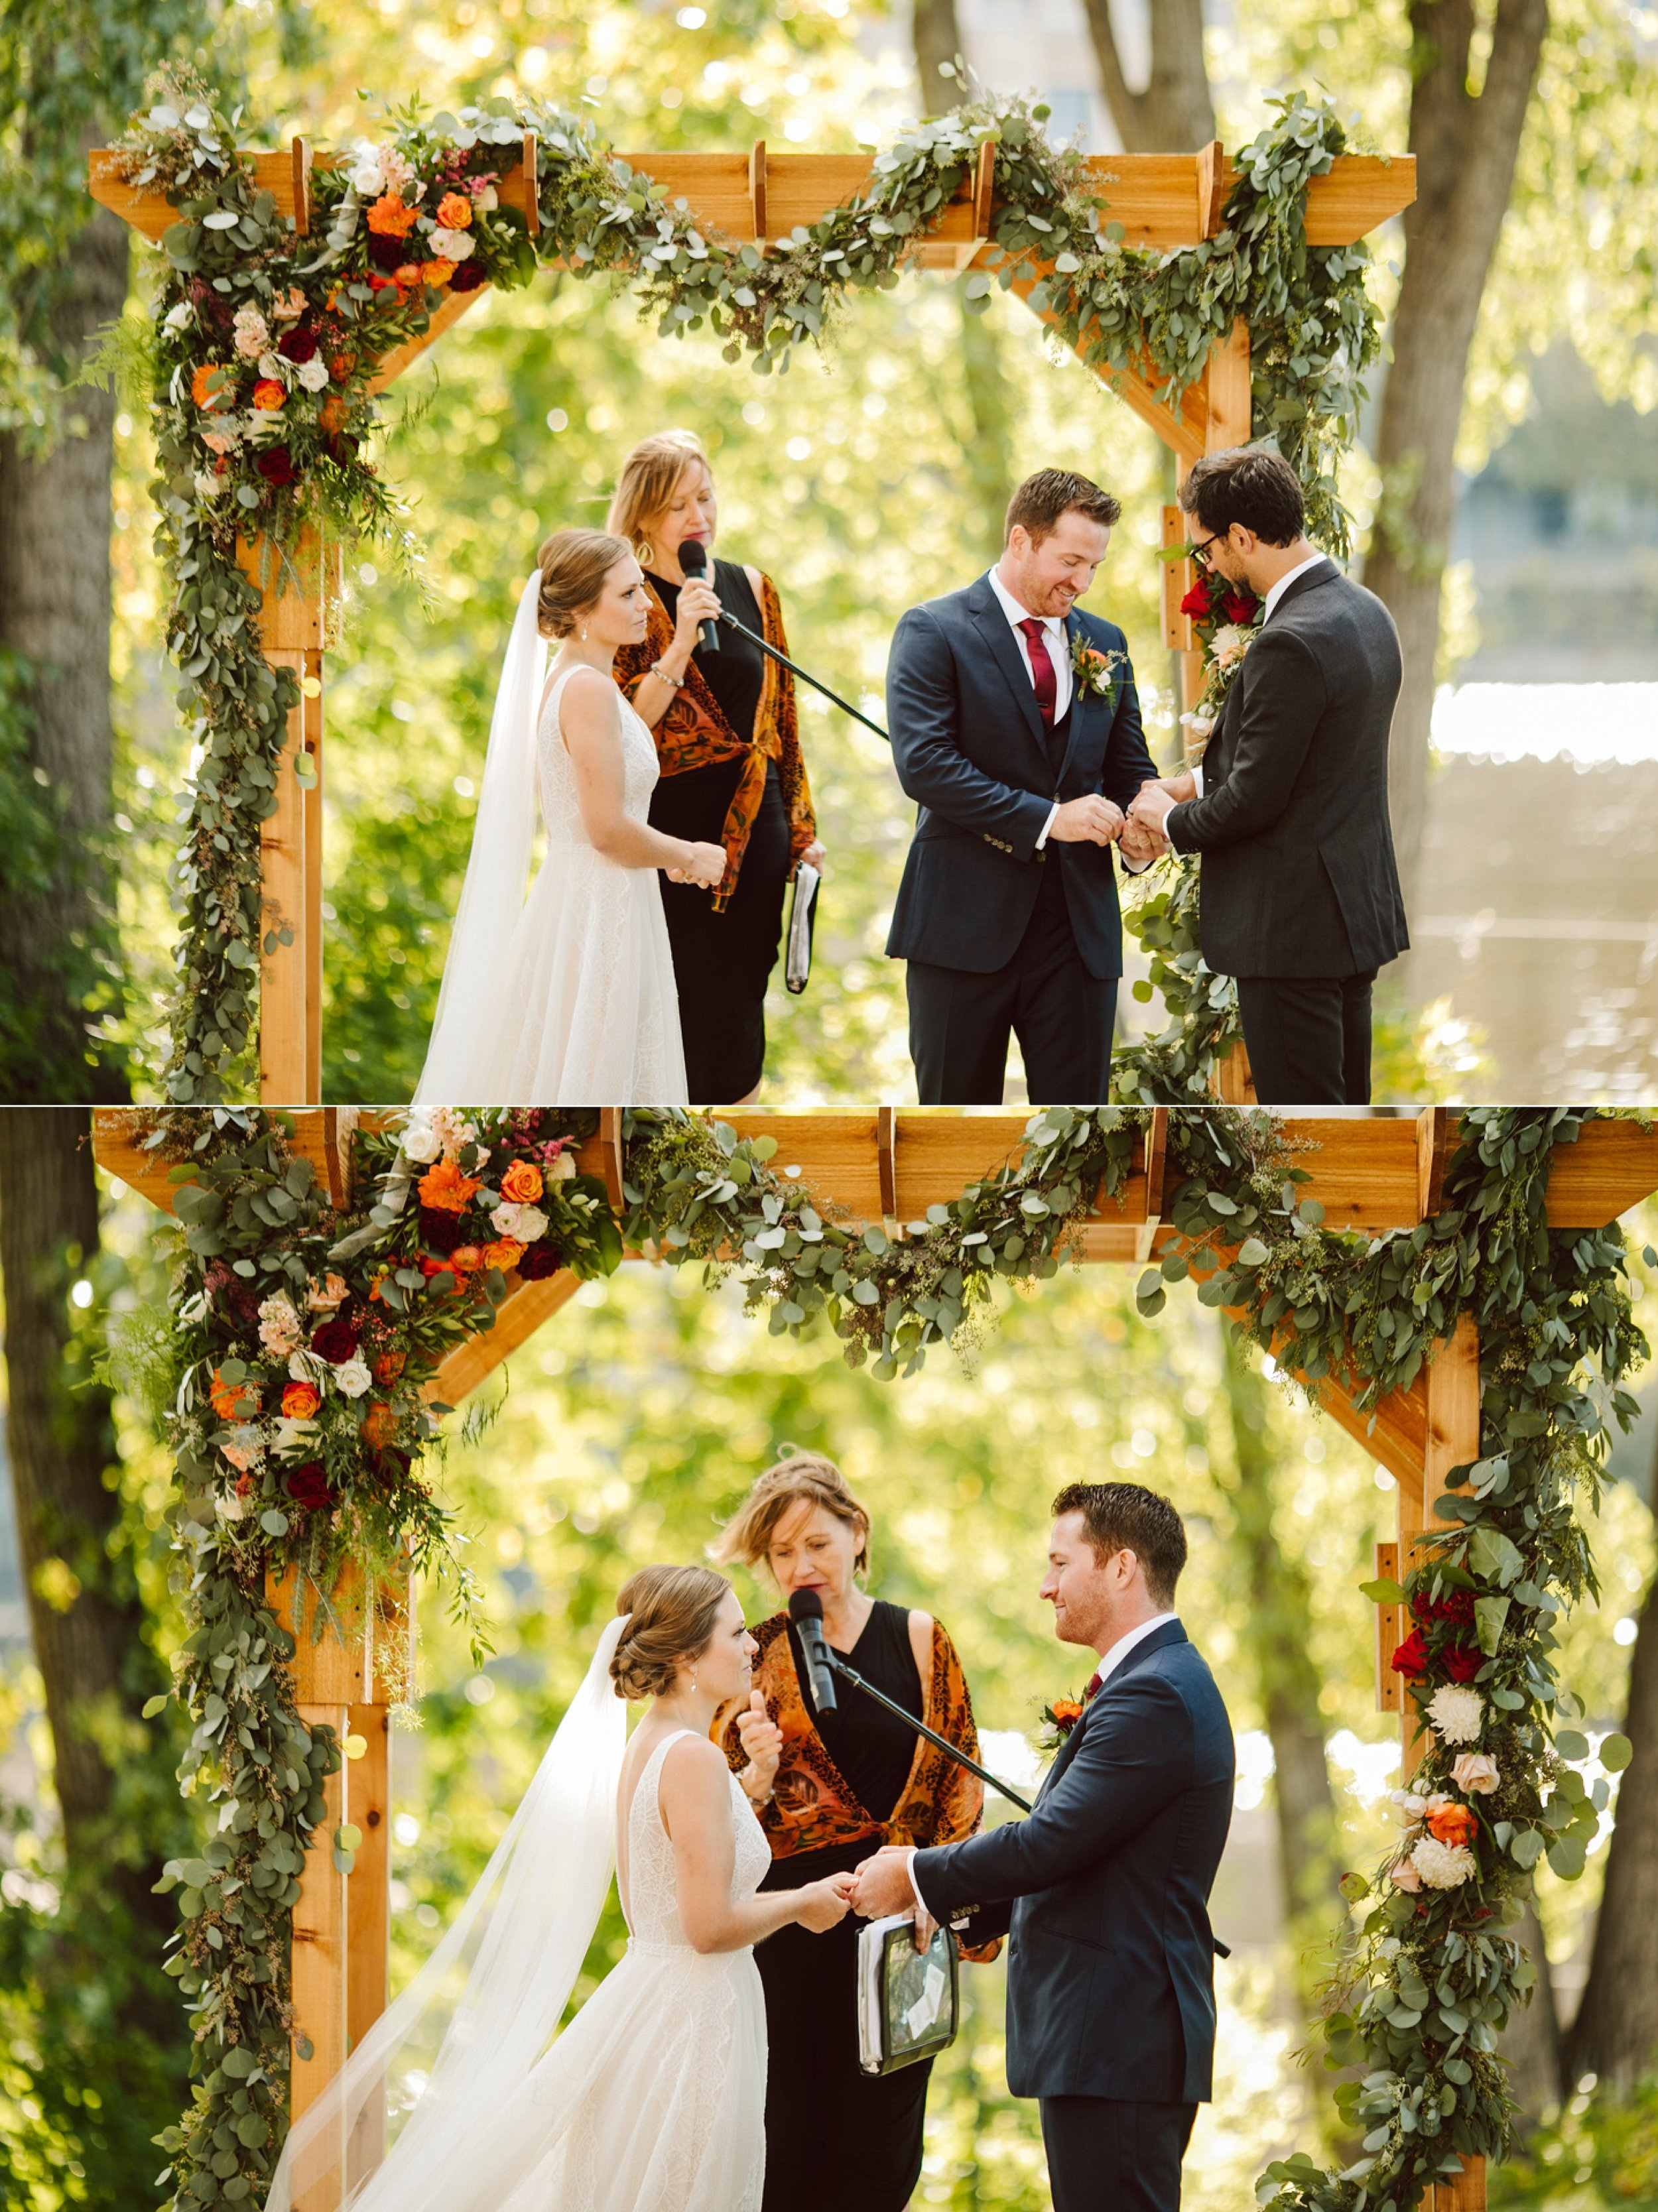 Nicollet-Island-Pavilion-Minneapolis-September-Coral-Navy-Wedding-112.jpg